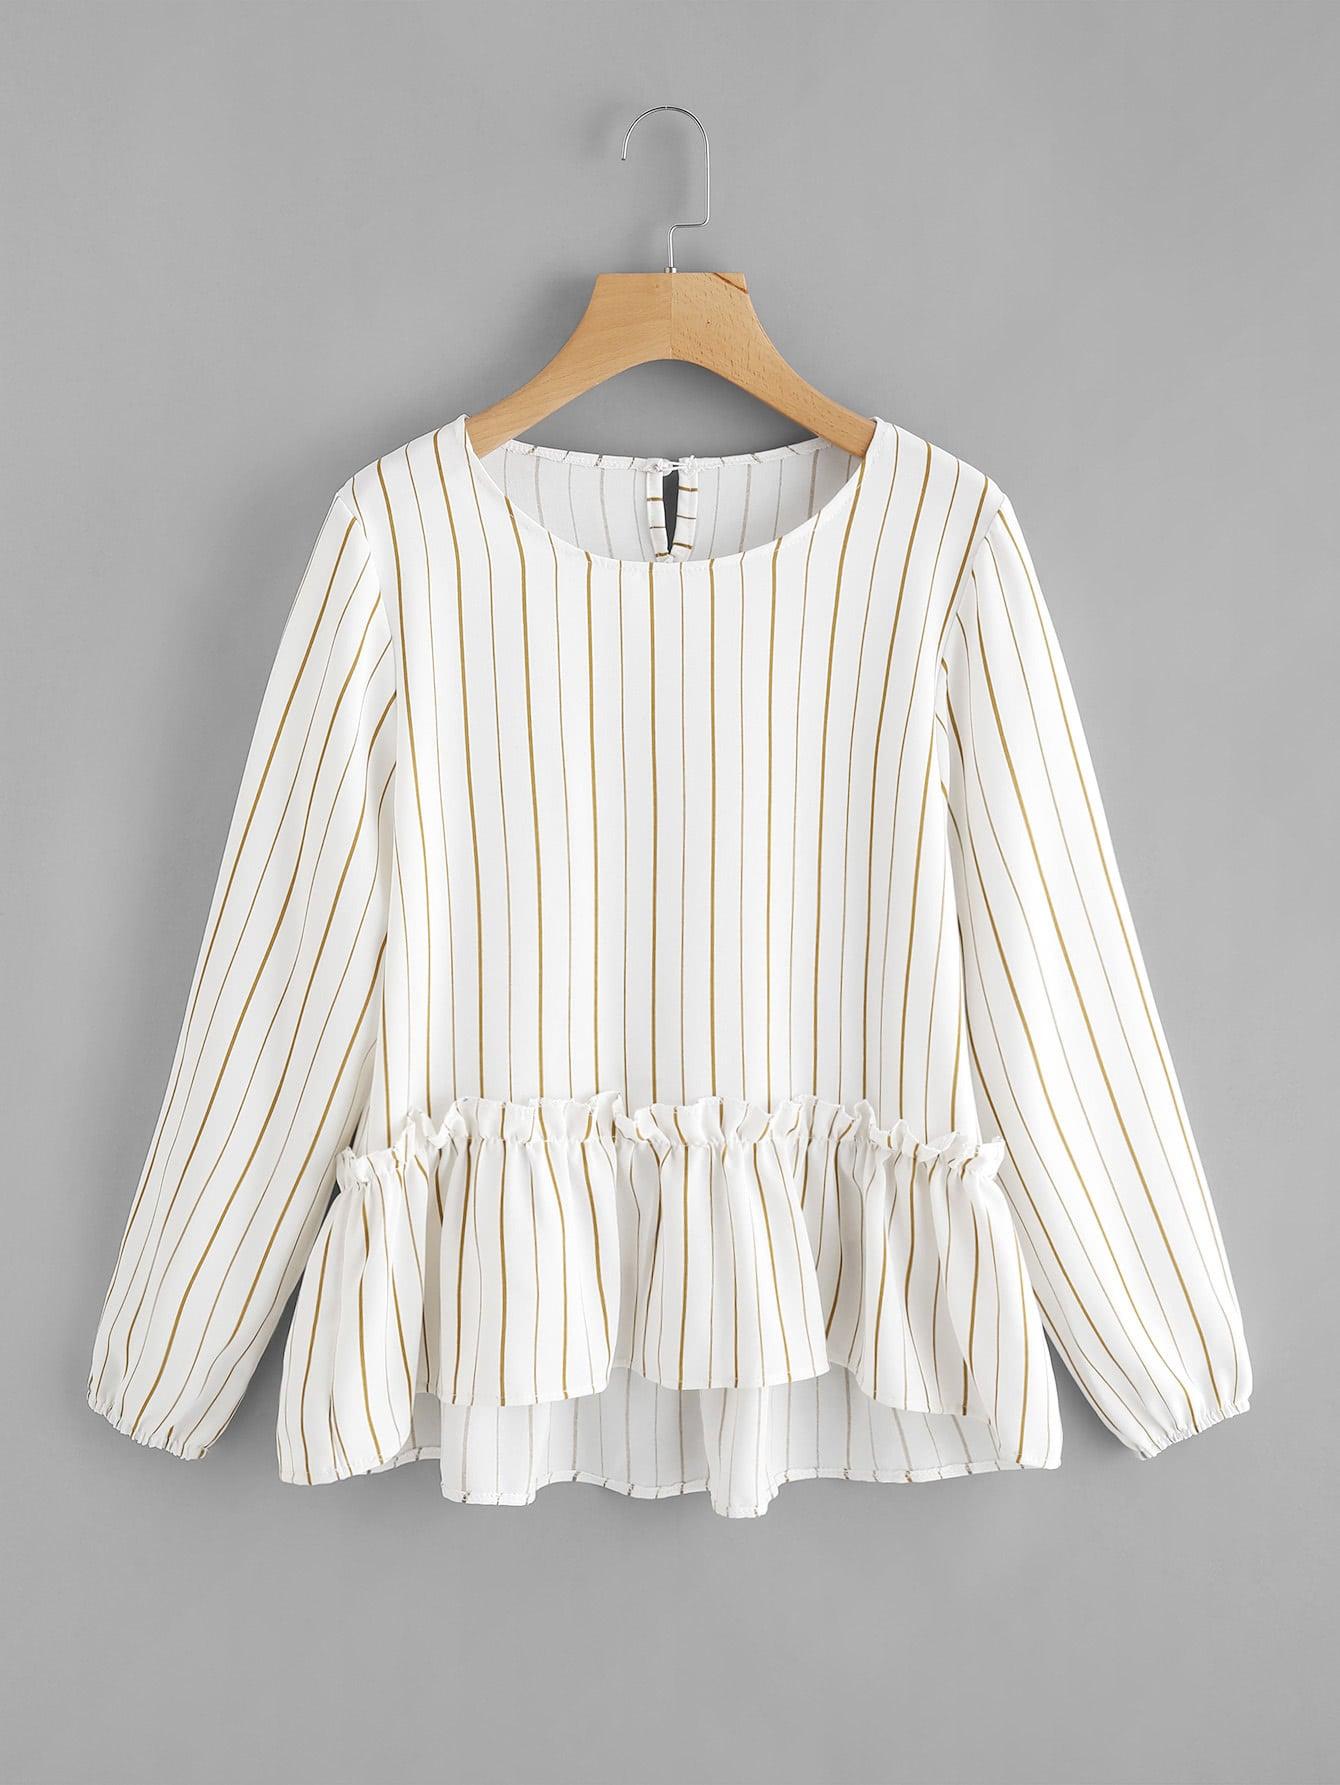 Vertical Striped Frill Hem Babydoll Blouse blouse070905109